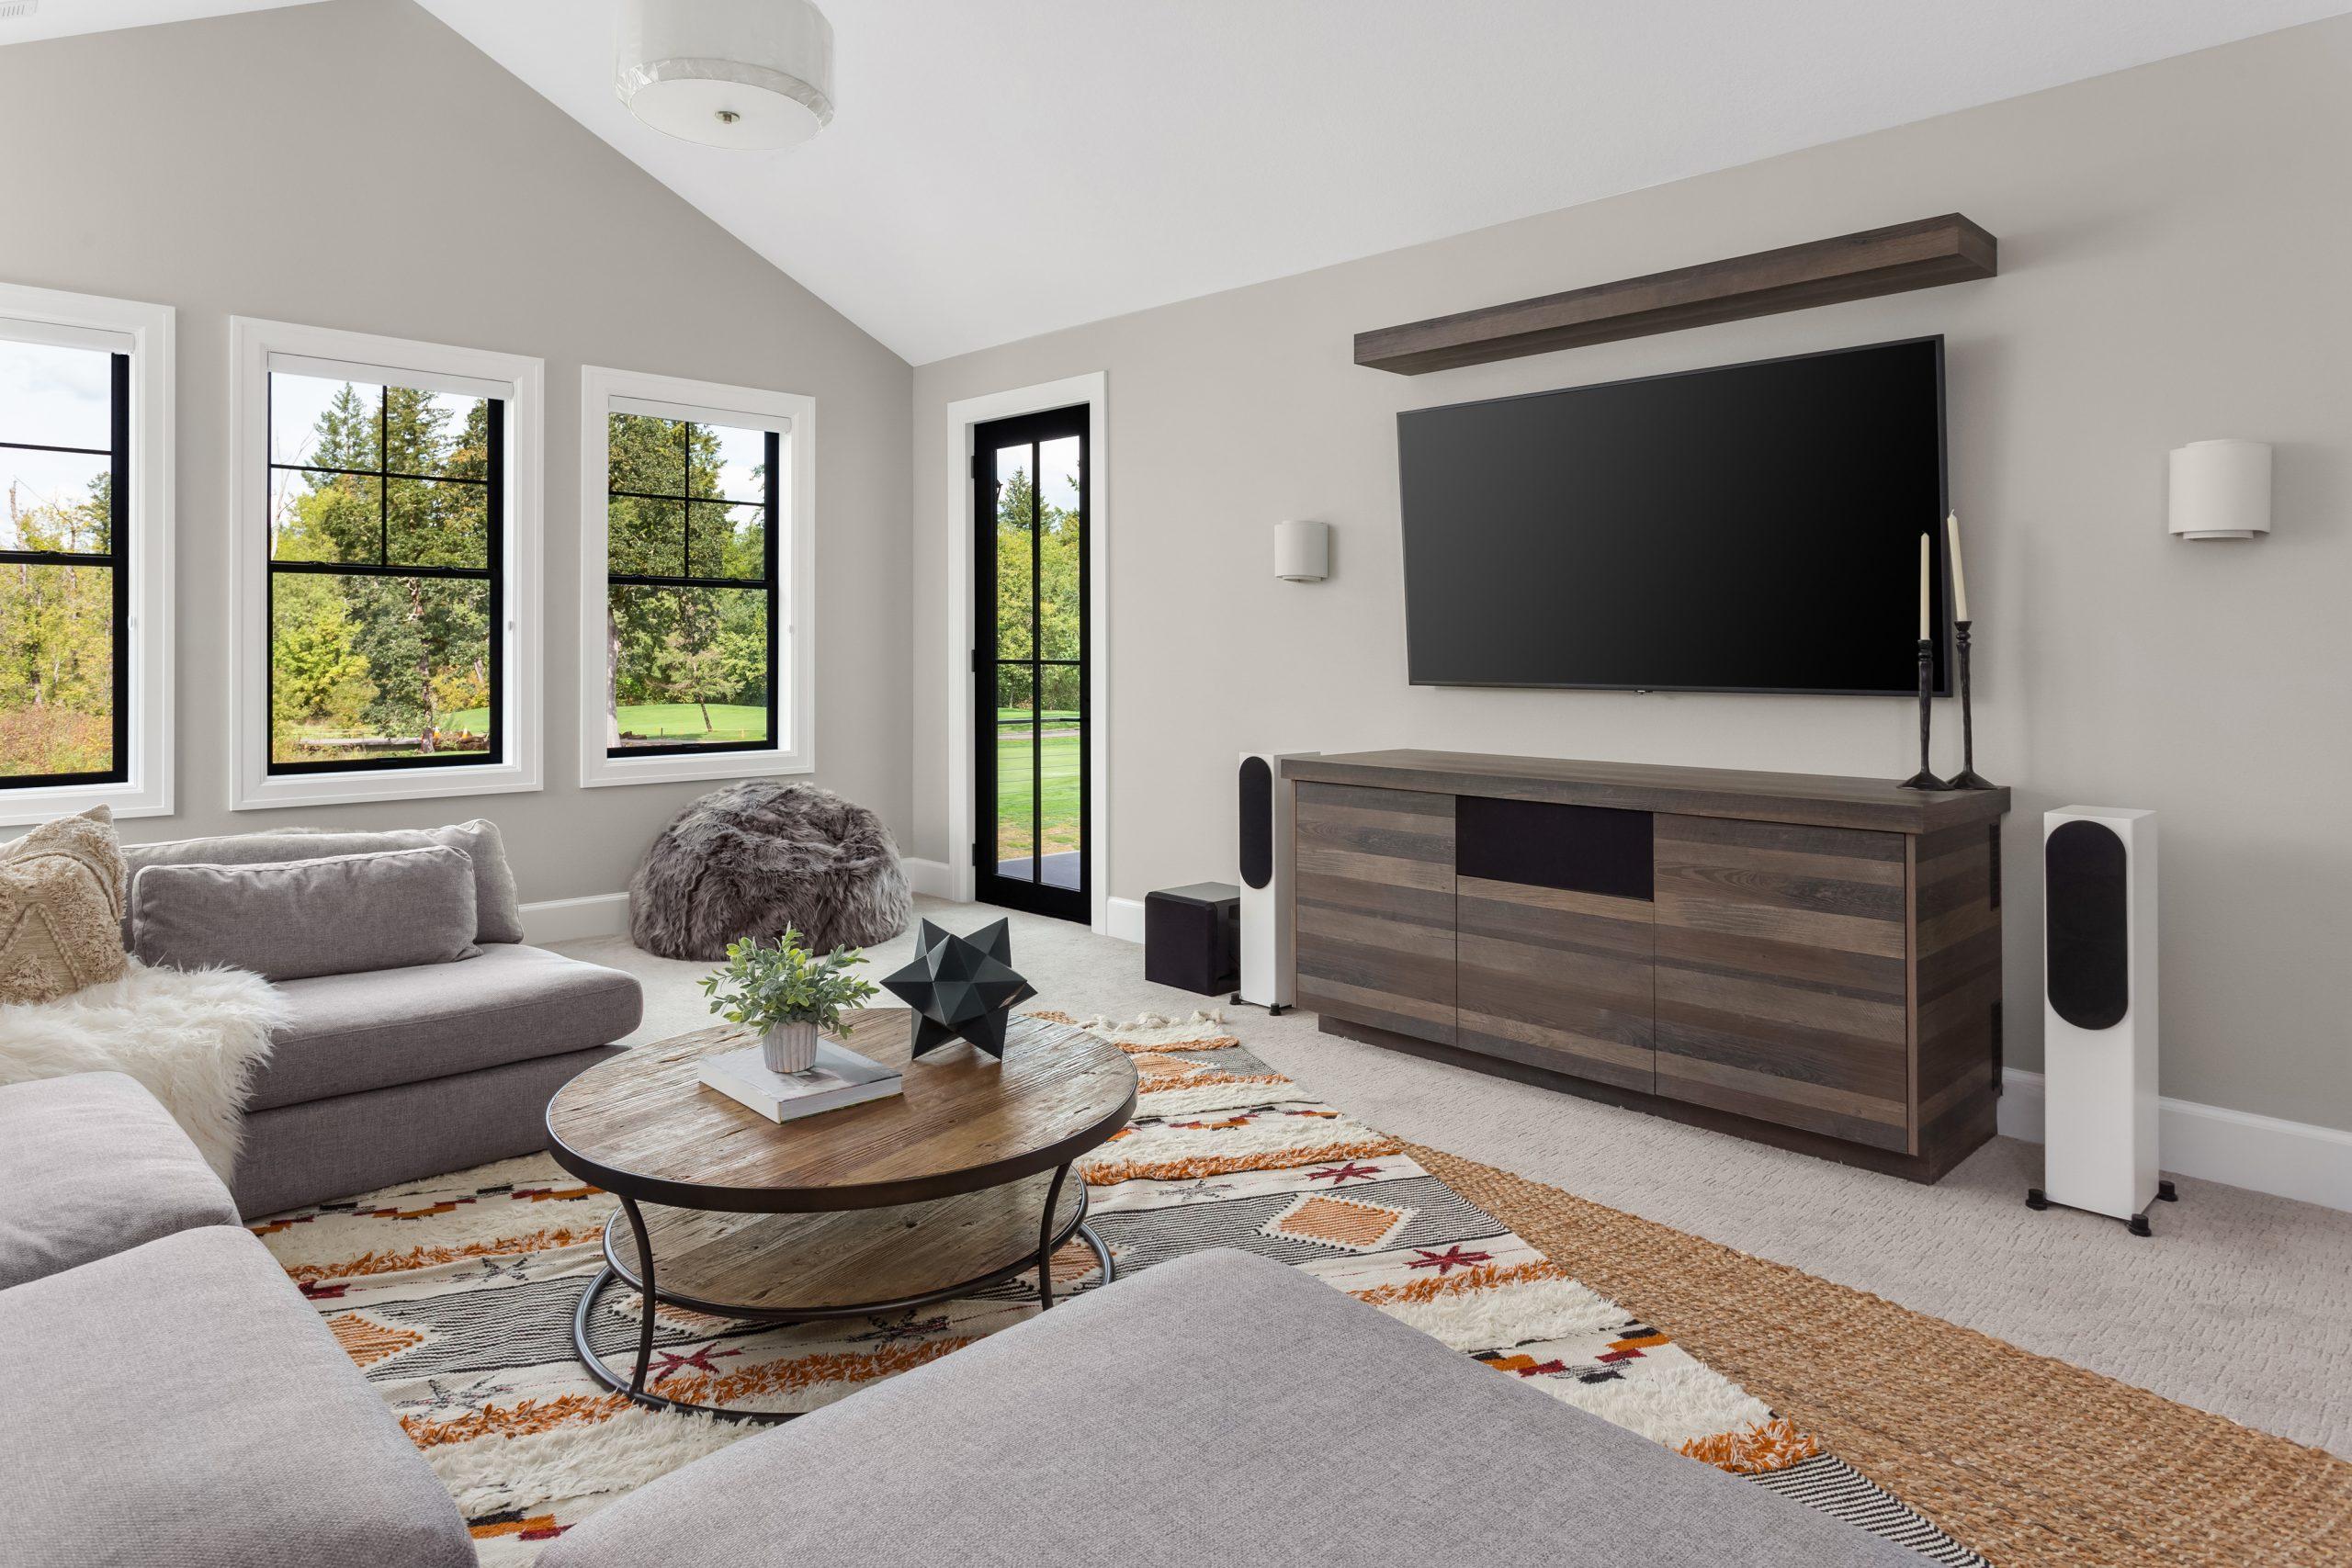 Carpet & Area Rugs in Entertainment Room | Chantilly, VA